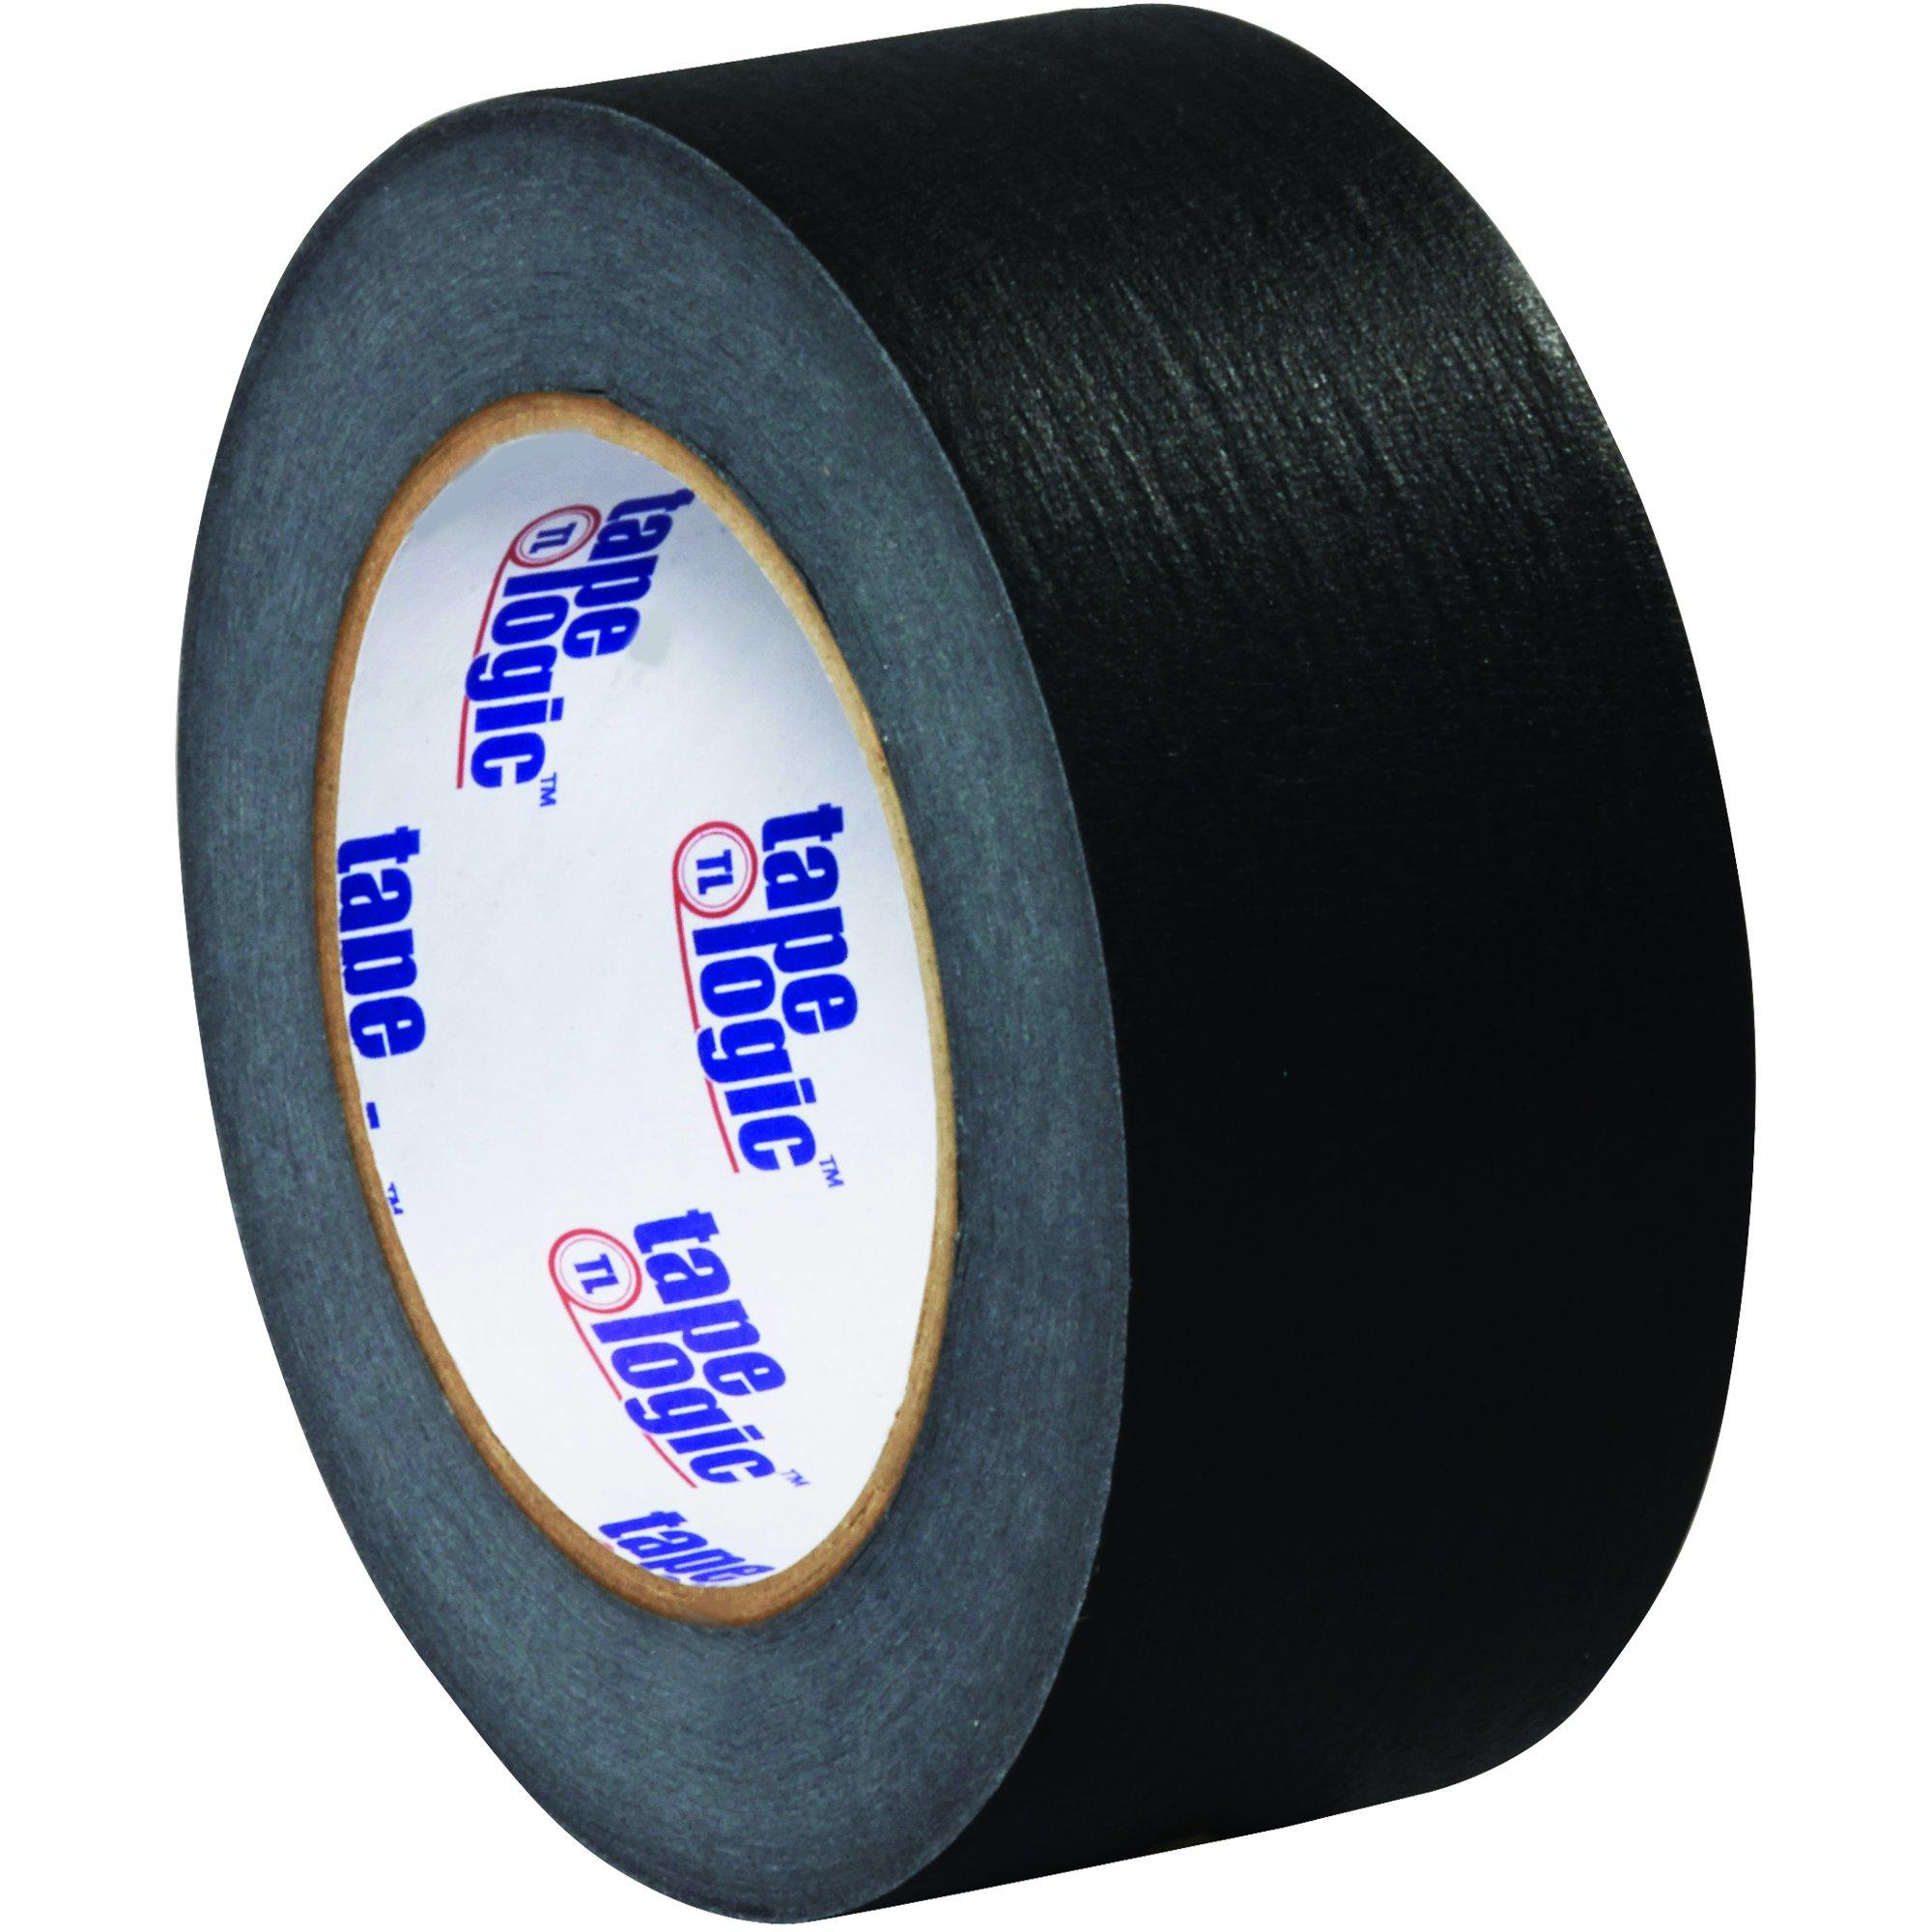 BOX USA BT937003B Tape Logic Masking Tape, 2'' x 60 yd., Black (Pack of 24)